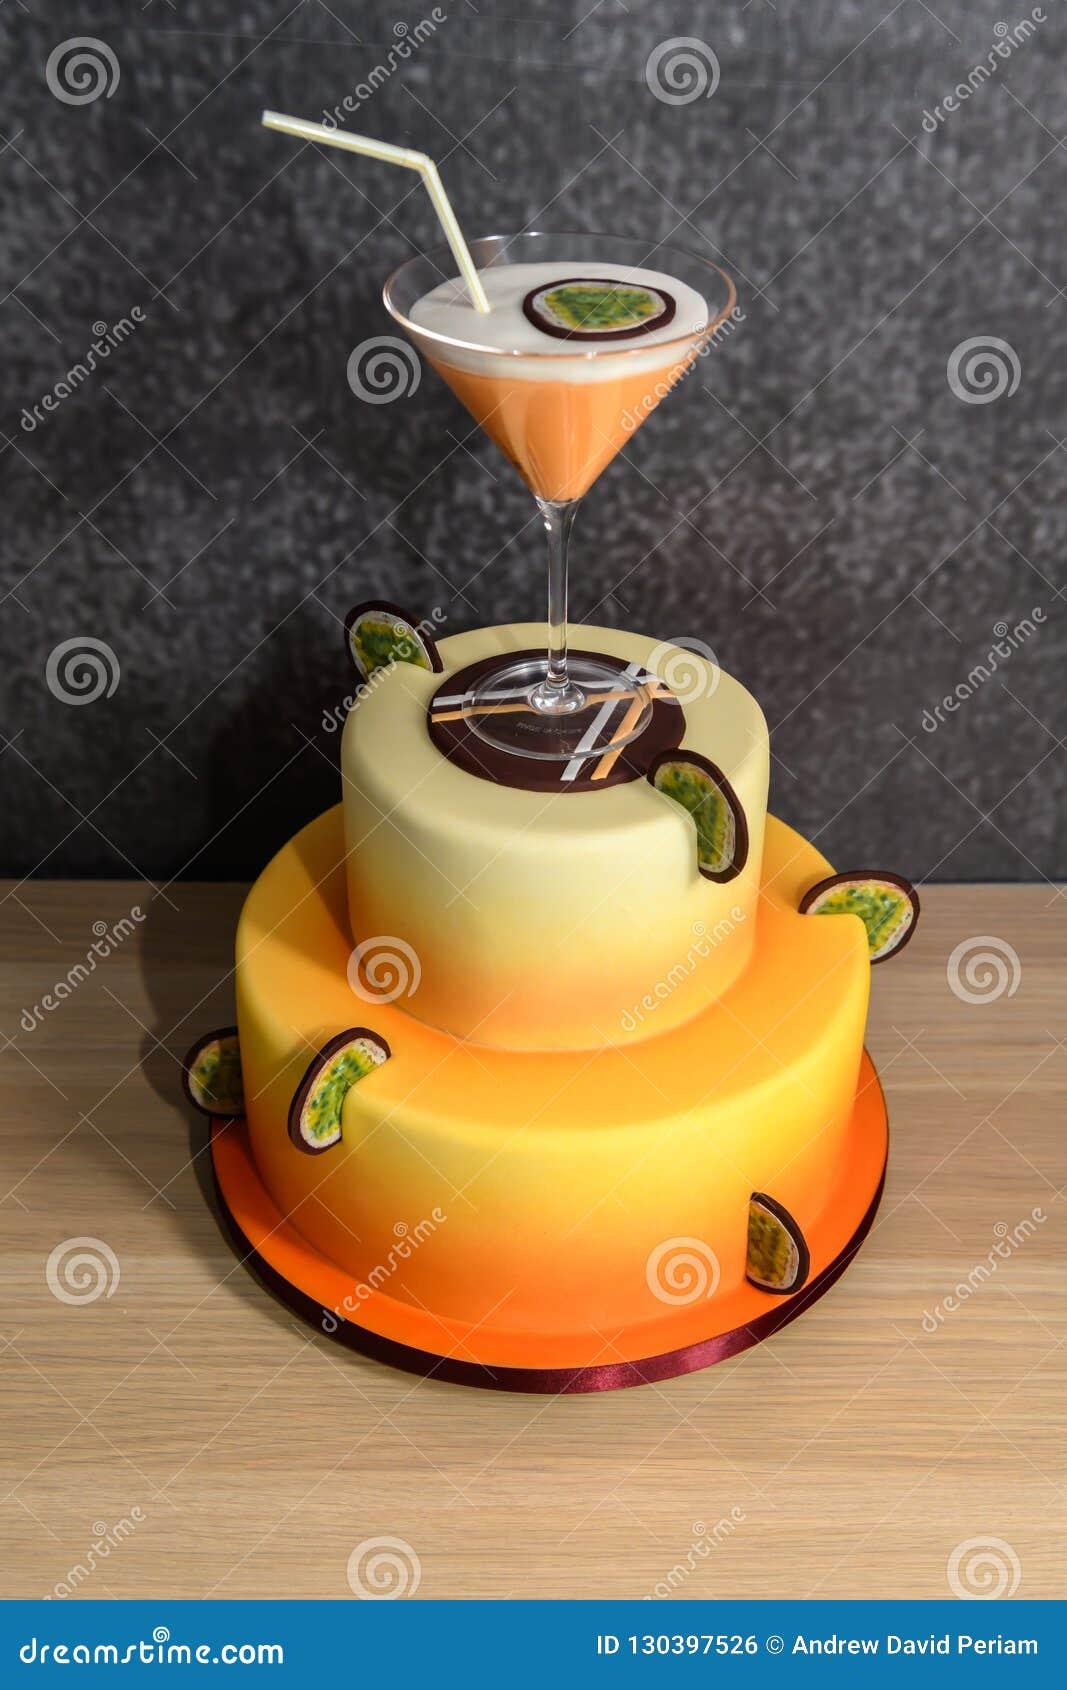 Pleasant Homemade Pornstar Cocktail Cake Stock Photo Image Of Beverage Birthday Cards Printable Inklcafe Filternl